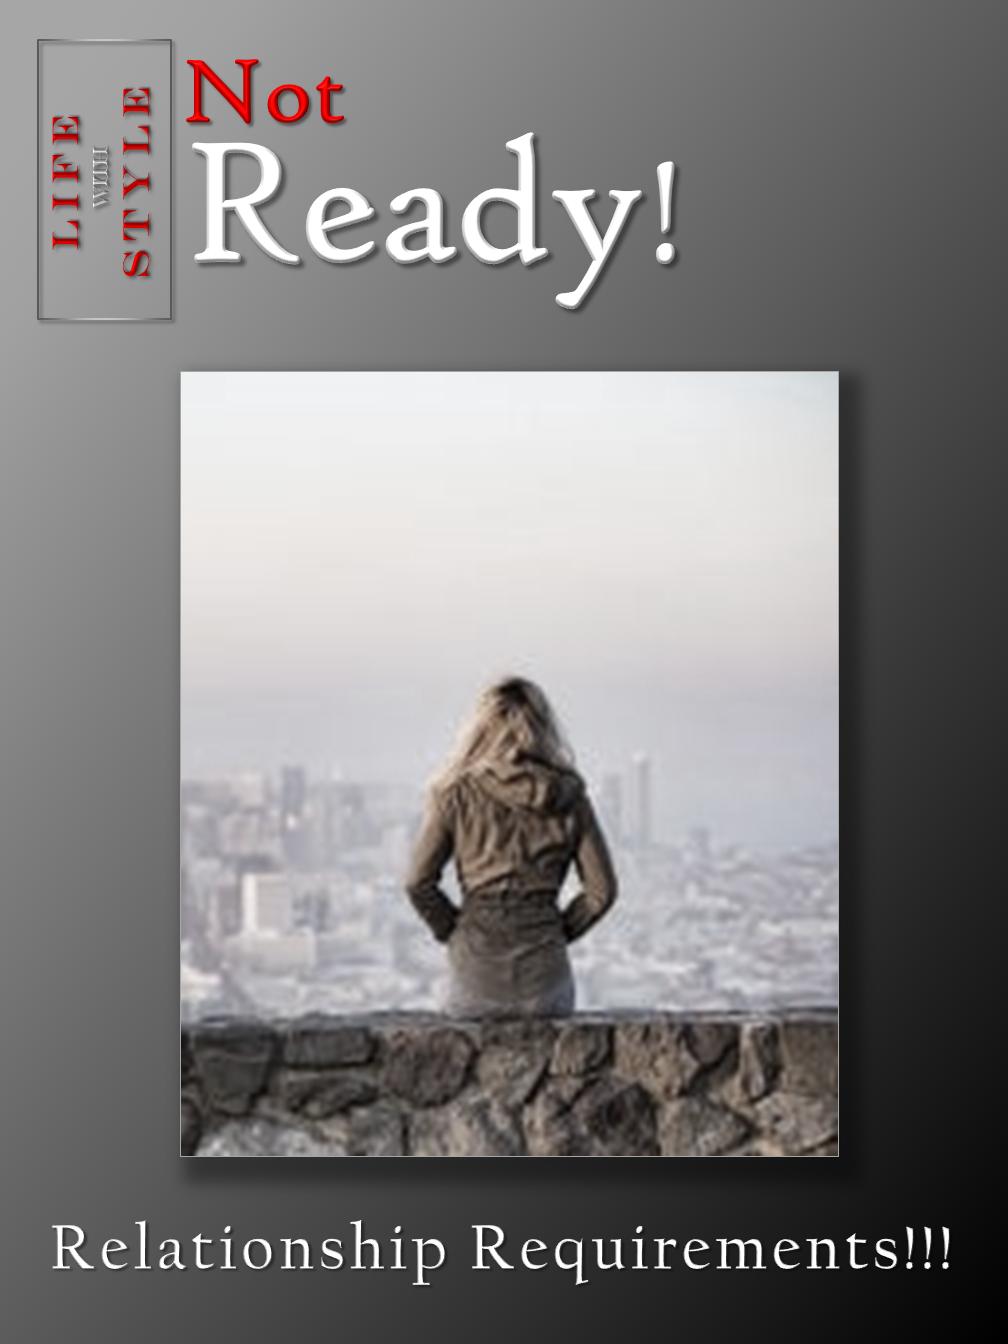 Not Ready!